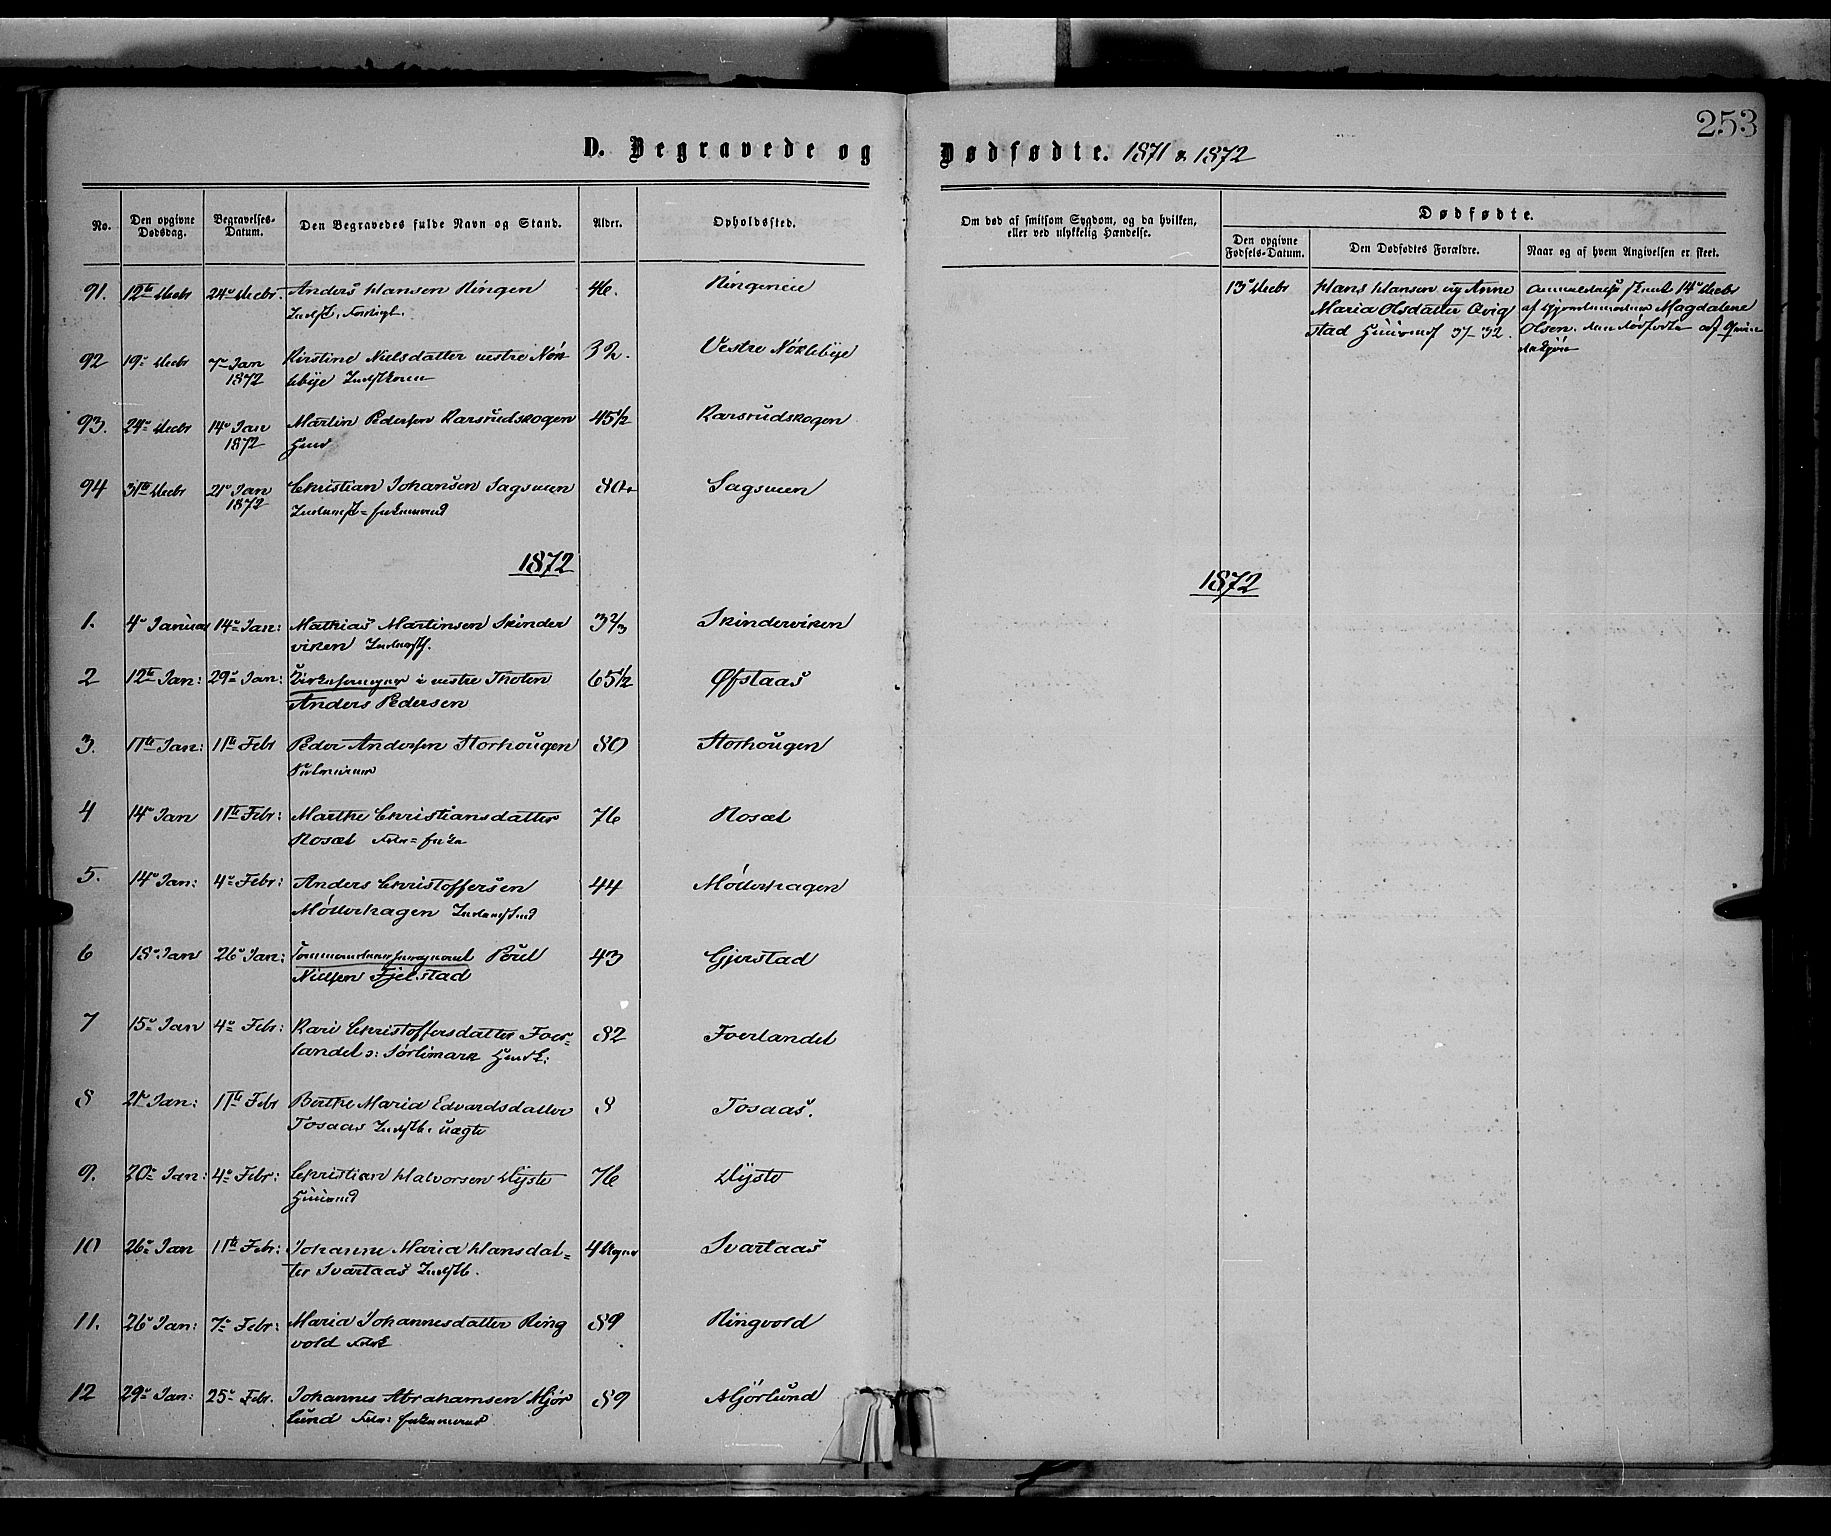 SAH, Vestre Toten prestekontor, H/Ha/Haa/L0008: Ministerialbok nr. 8, 1870-1877, s. 253